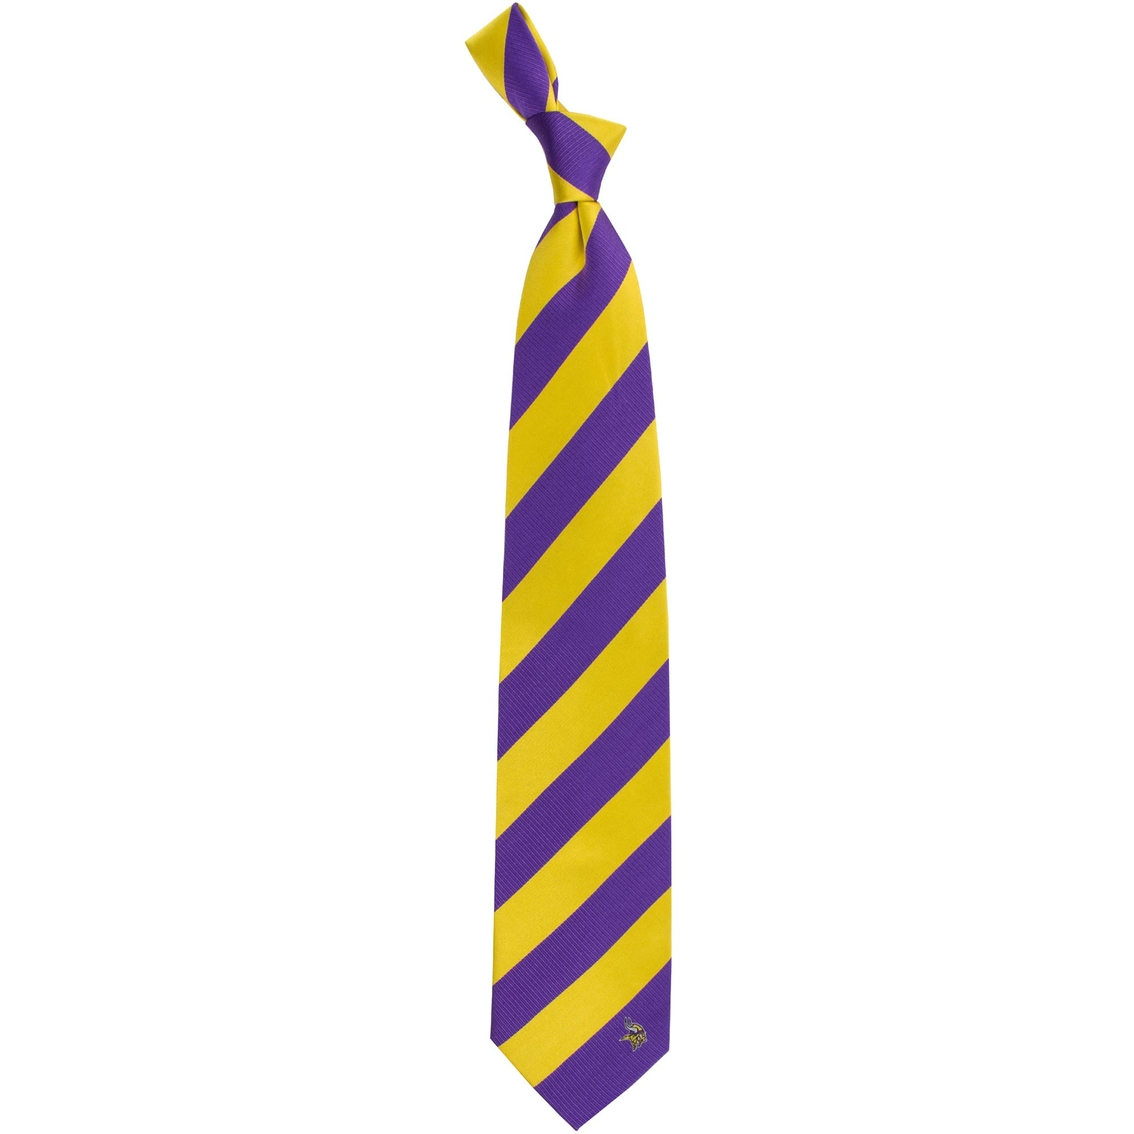 805e663387a Eagles Wings Nfl Minnesota Vikings Regiment Tie